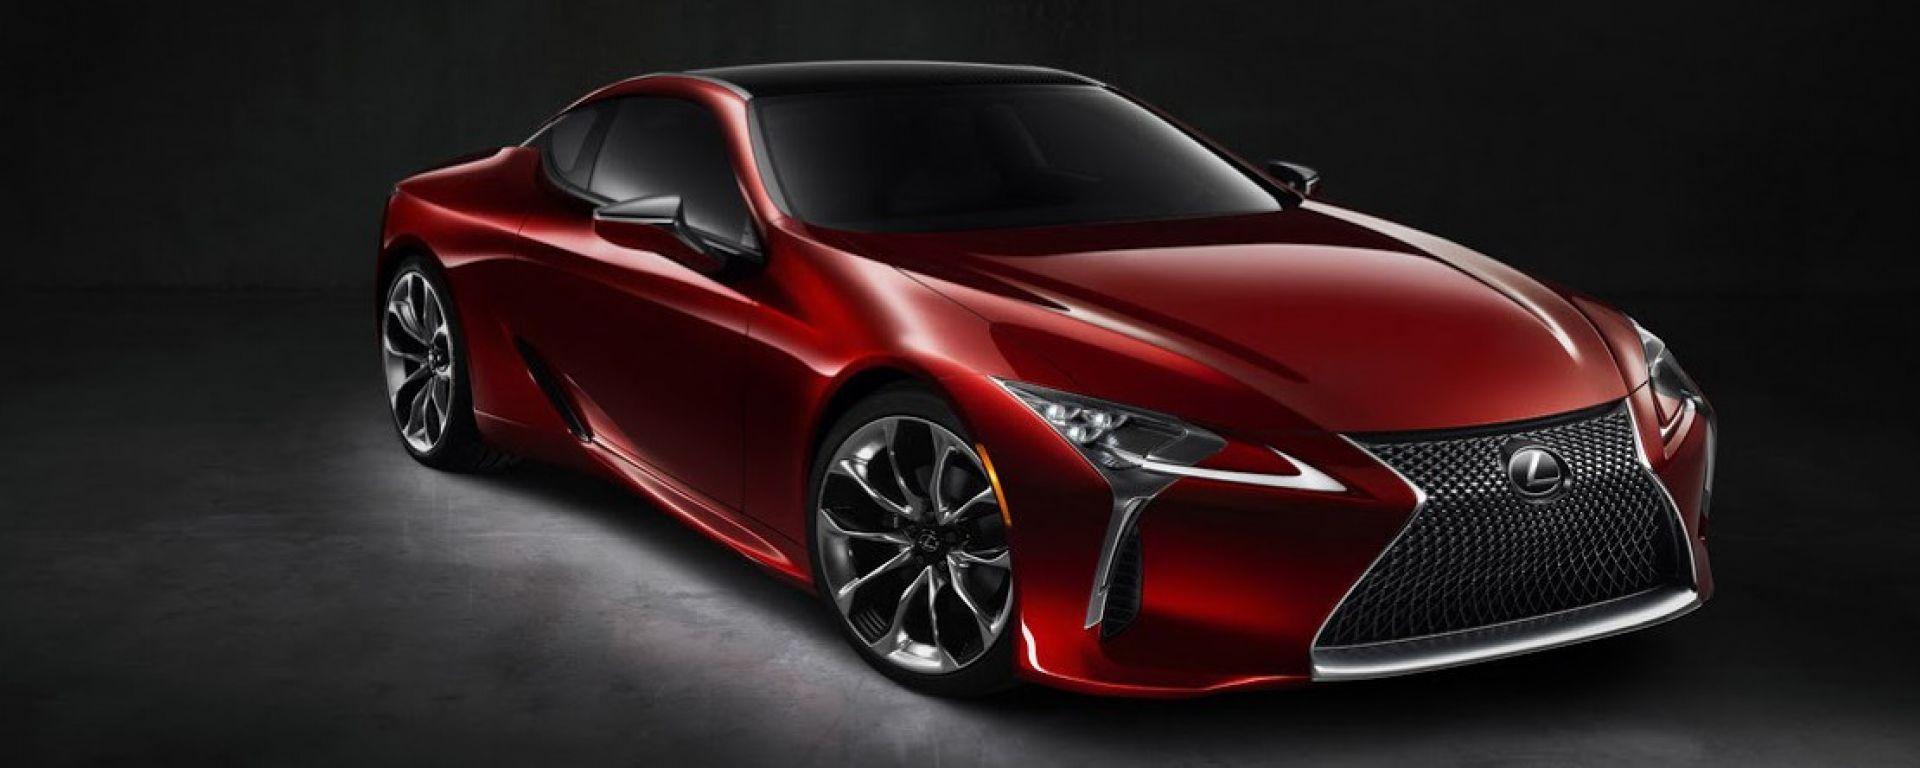 Lexus LC 500: svelata in un nuovo video